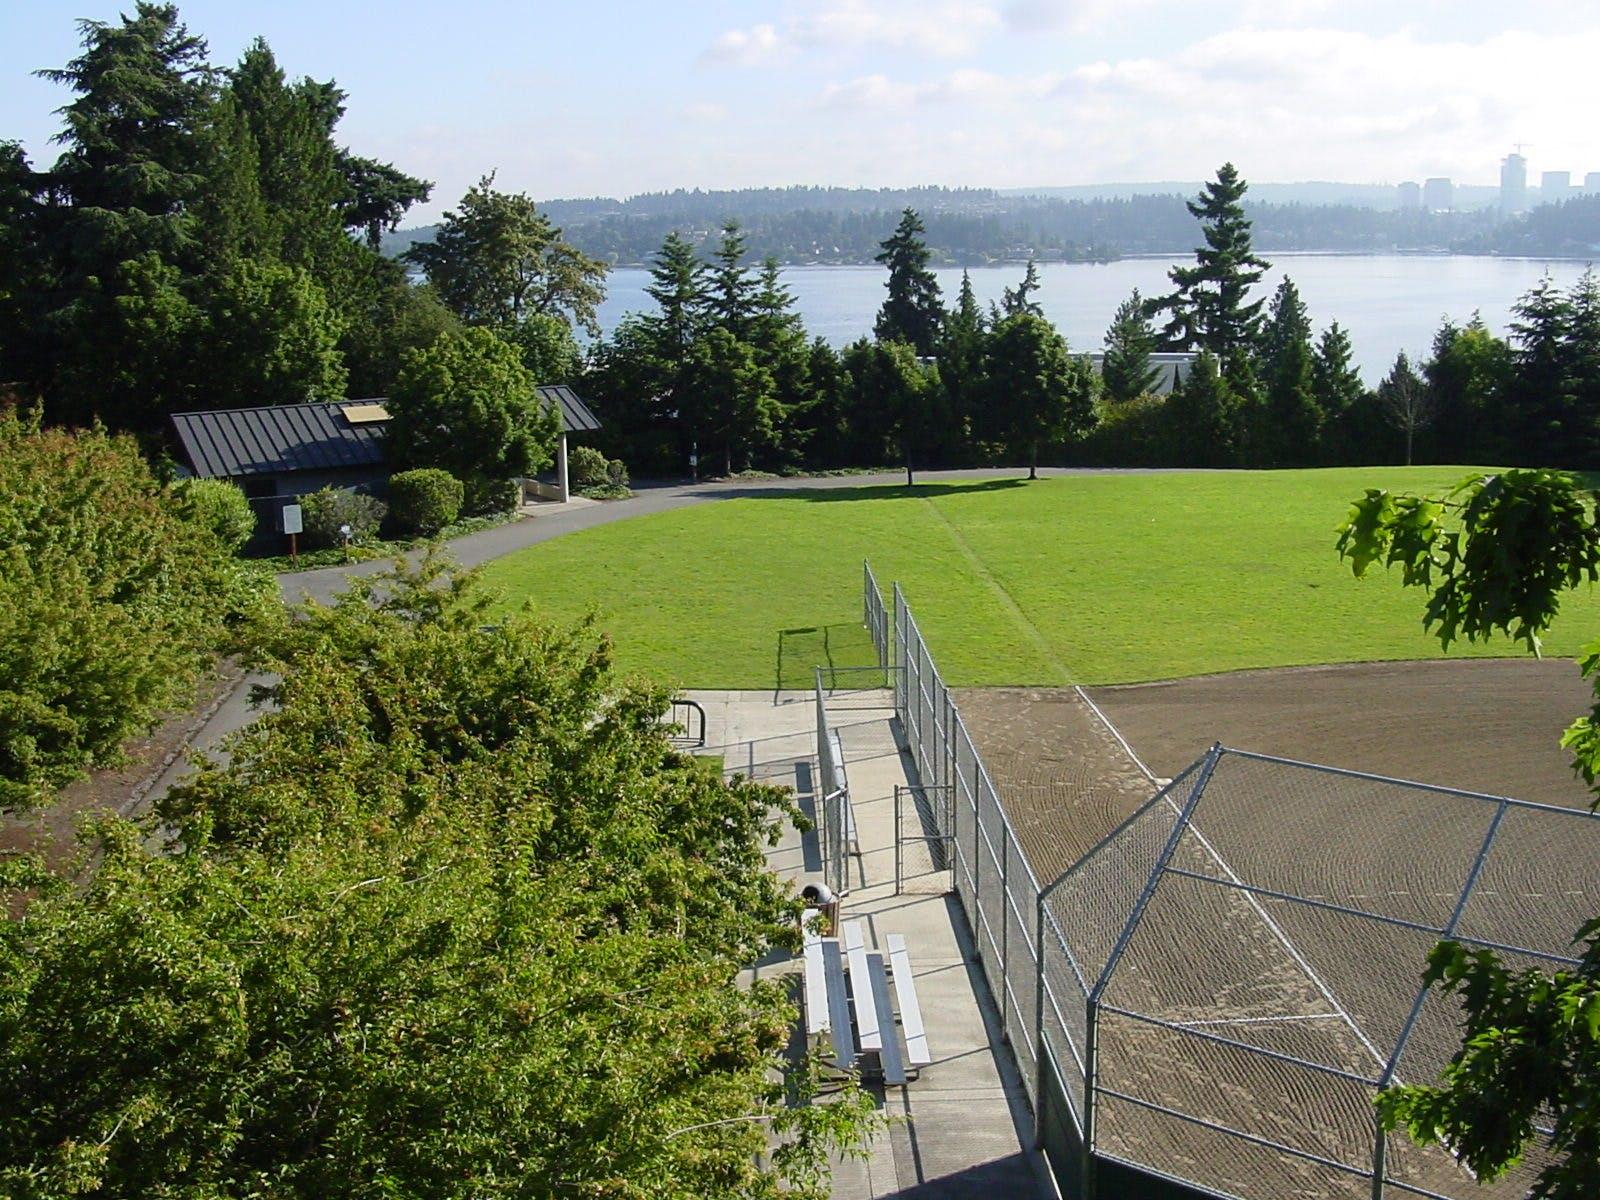 Lid Baseball Field